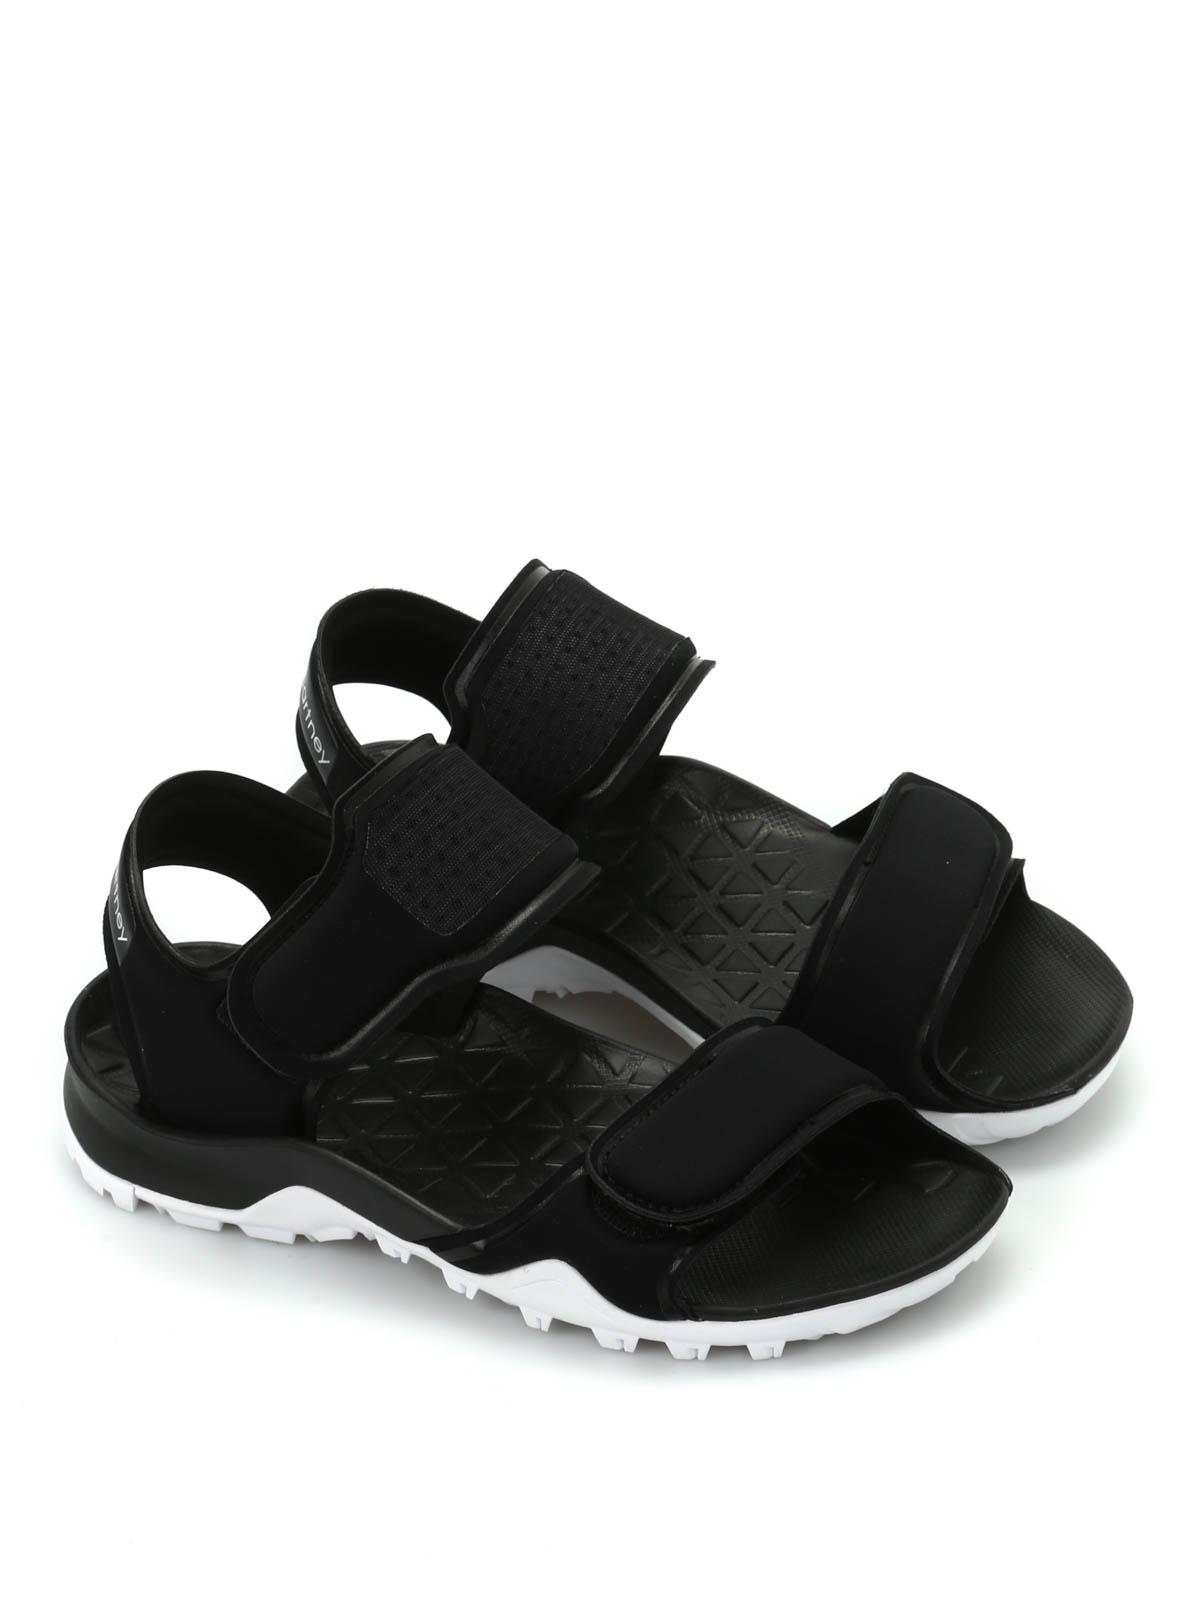 Adidas by Stella McCartney: sandals - Hikara sport sandals